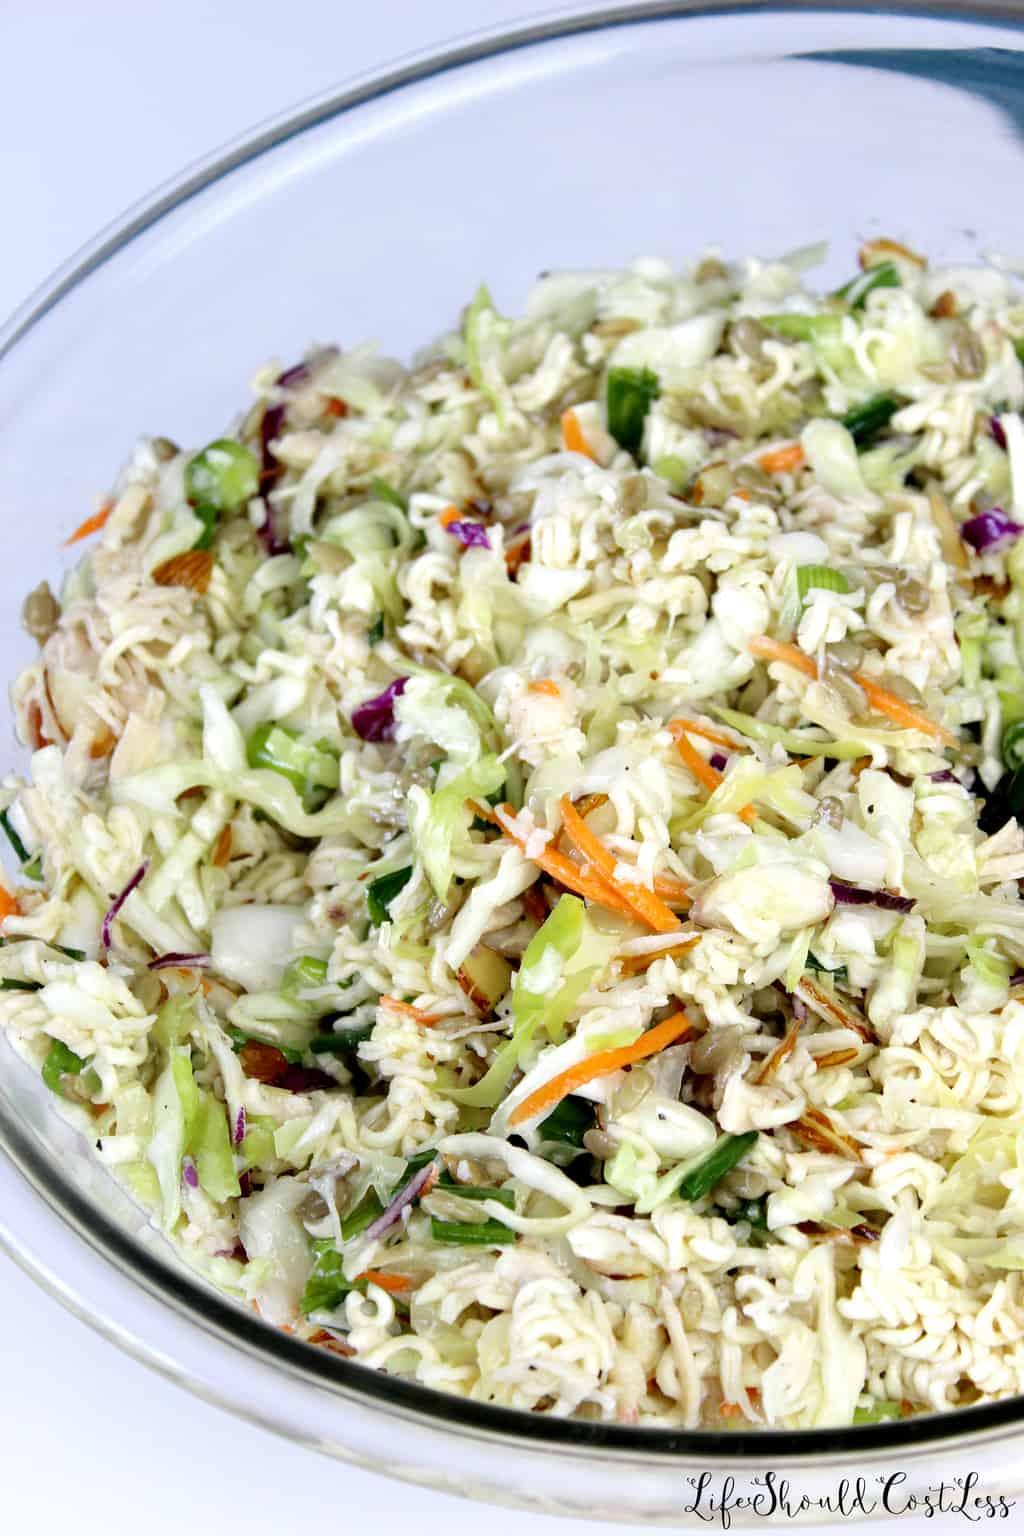 Top Ramen Chicken Salad Recipe.